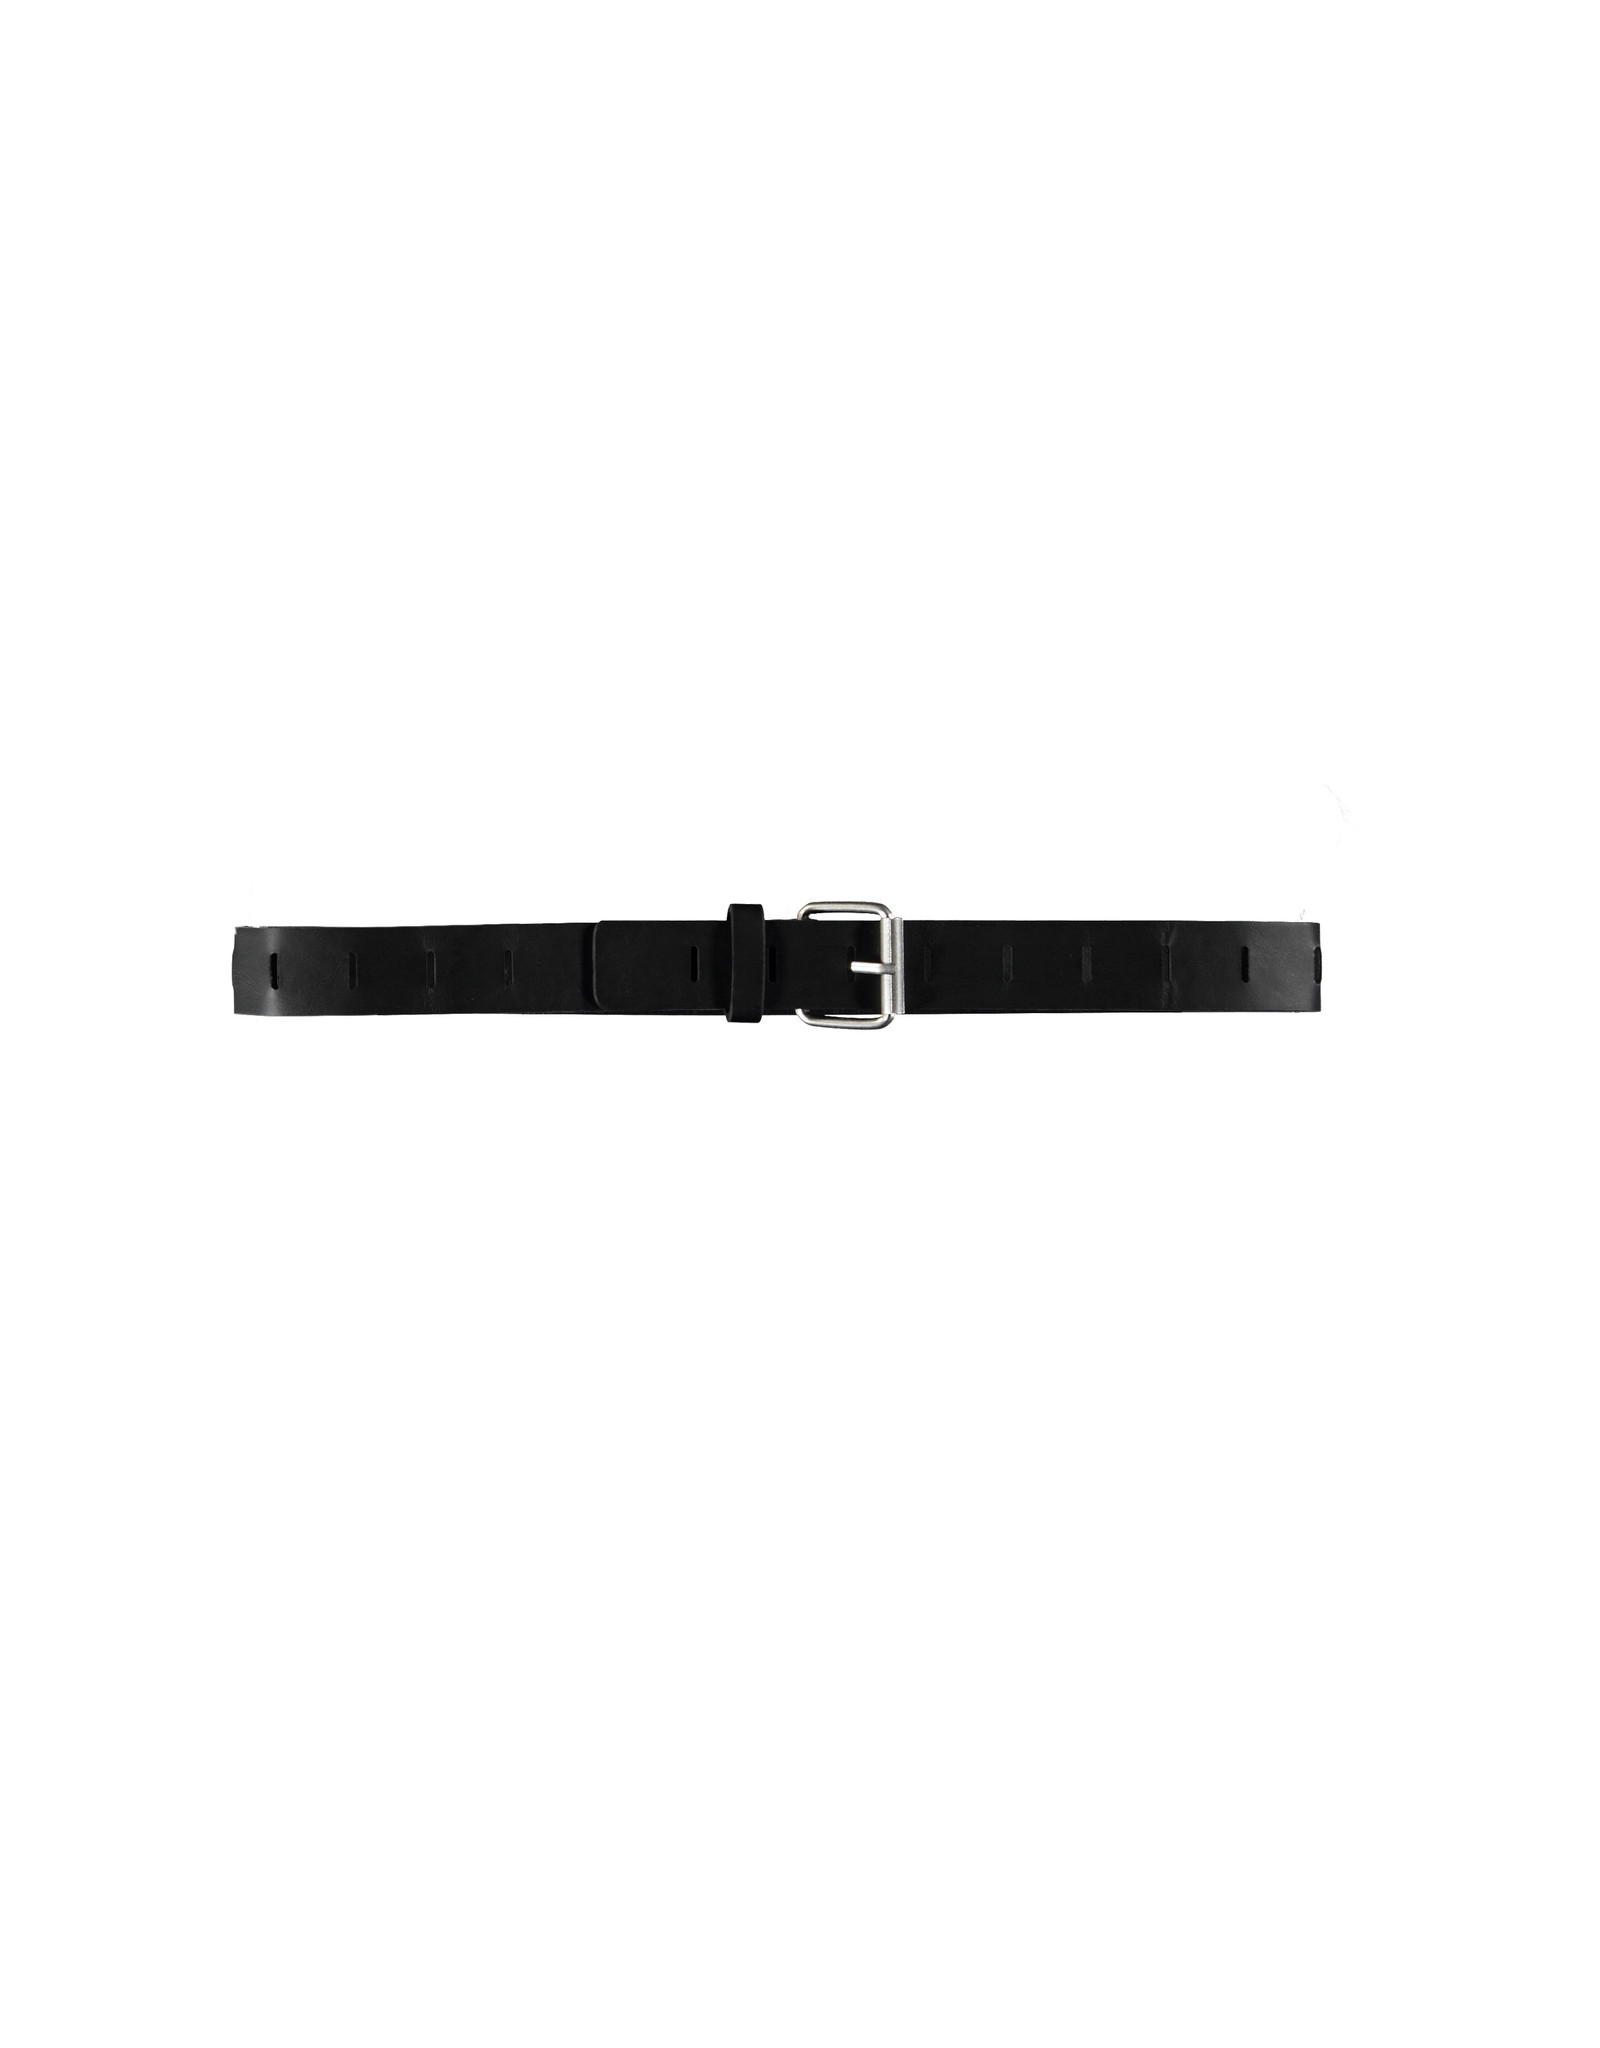 TYGO & Vito TYGO & Vito Adjustable Belt Black